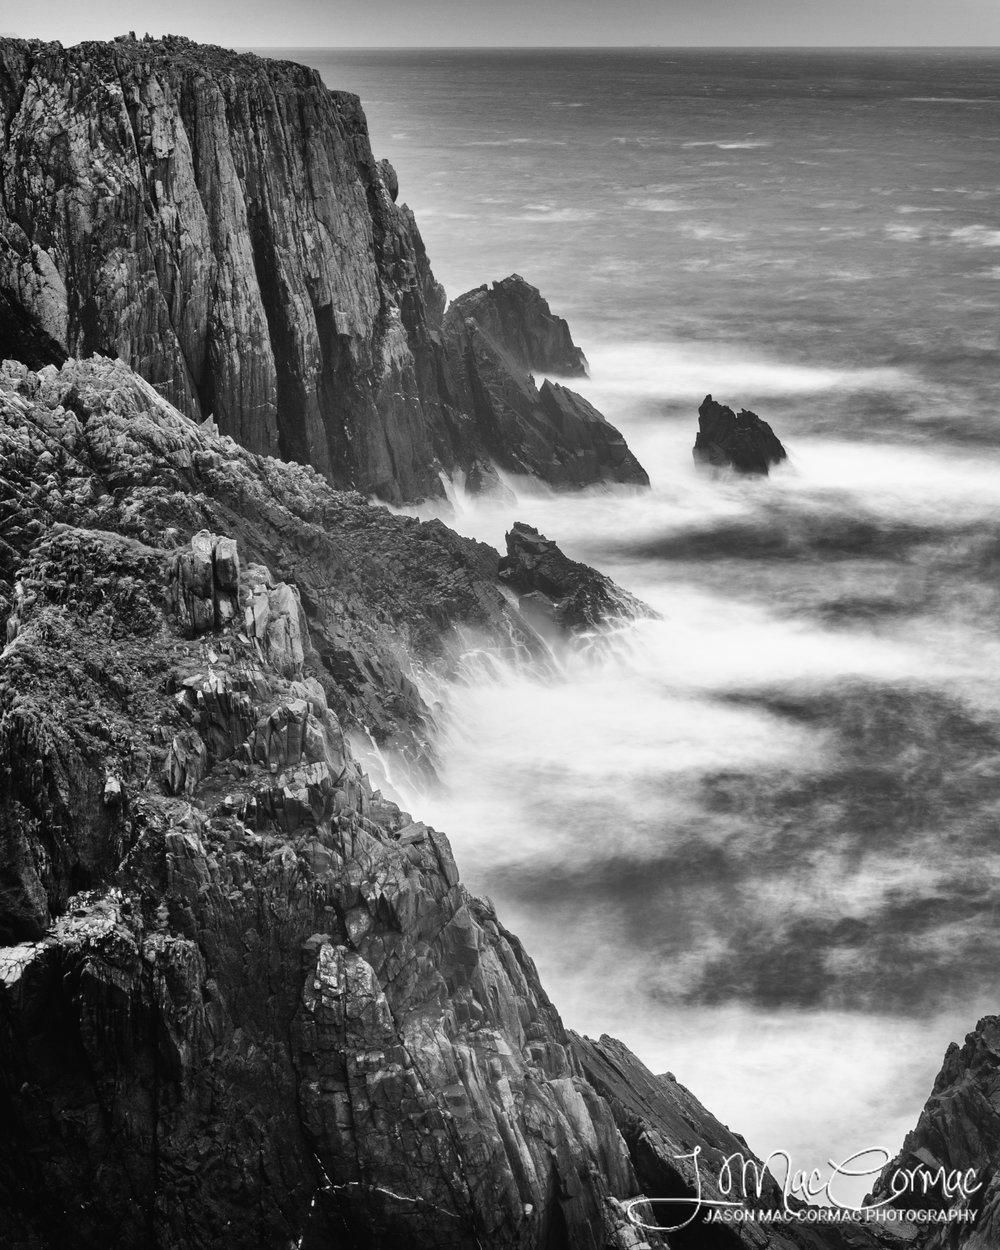 Coastal cliffs off Malin Head, County Donegal